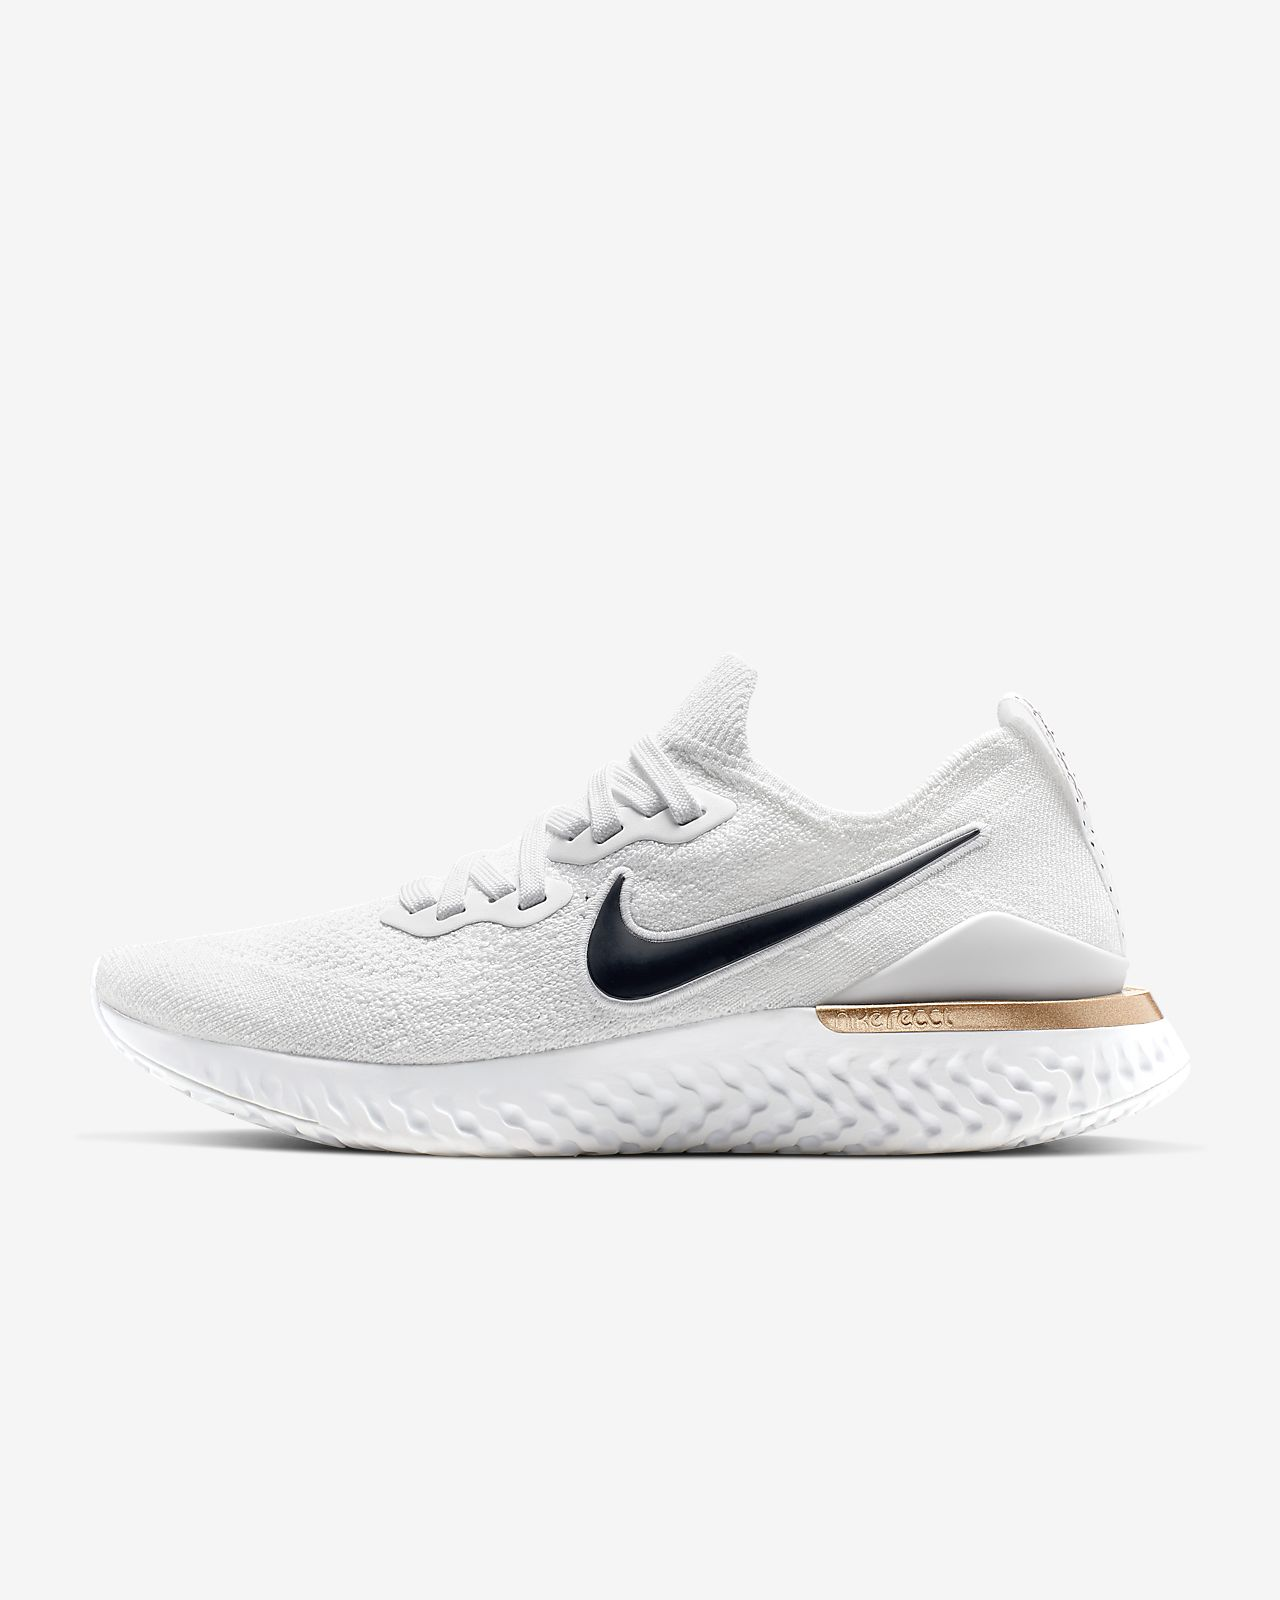 Nike Epic React Flyknit 2 Unité Totale Hardloopschoen voor dames